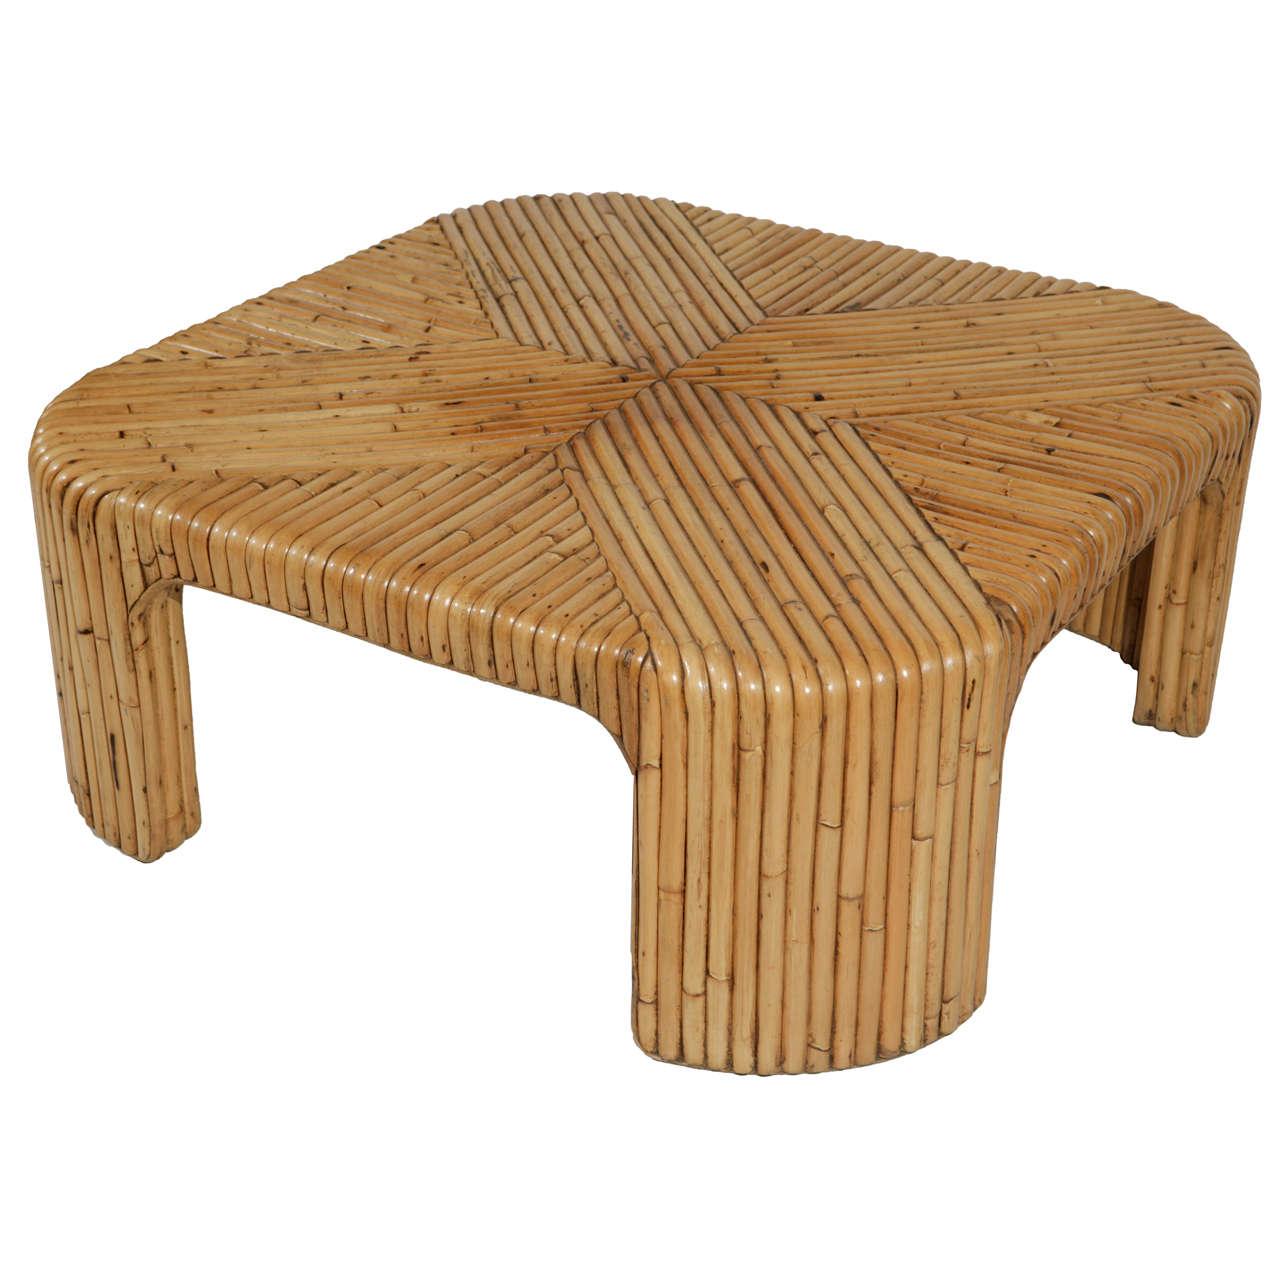 Modern Bamboo Coffee Table: 1970s Modern Bent Bamboo Inlay Coffee Table